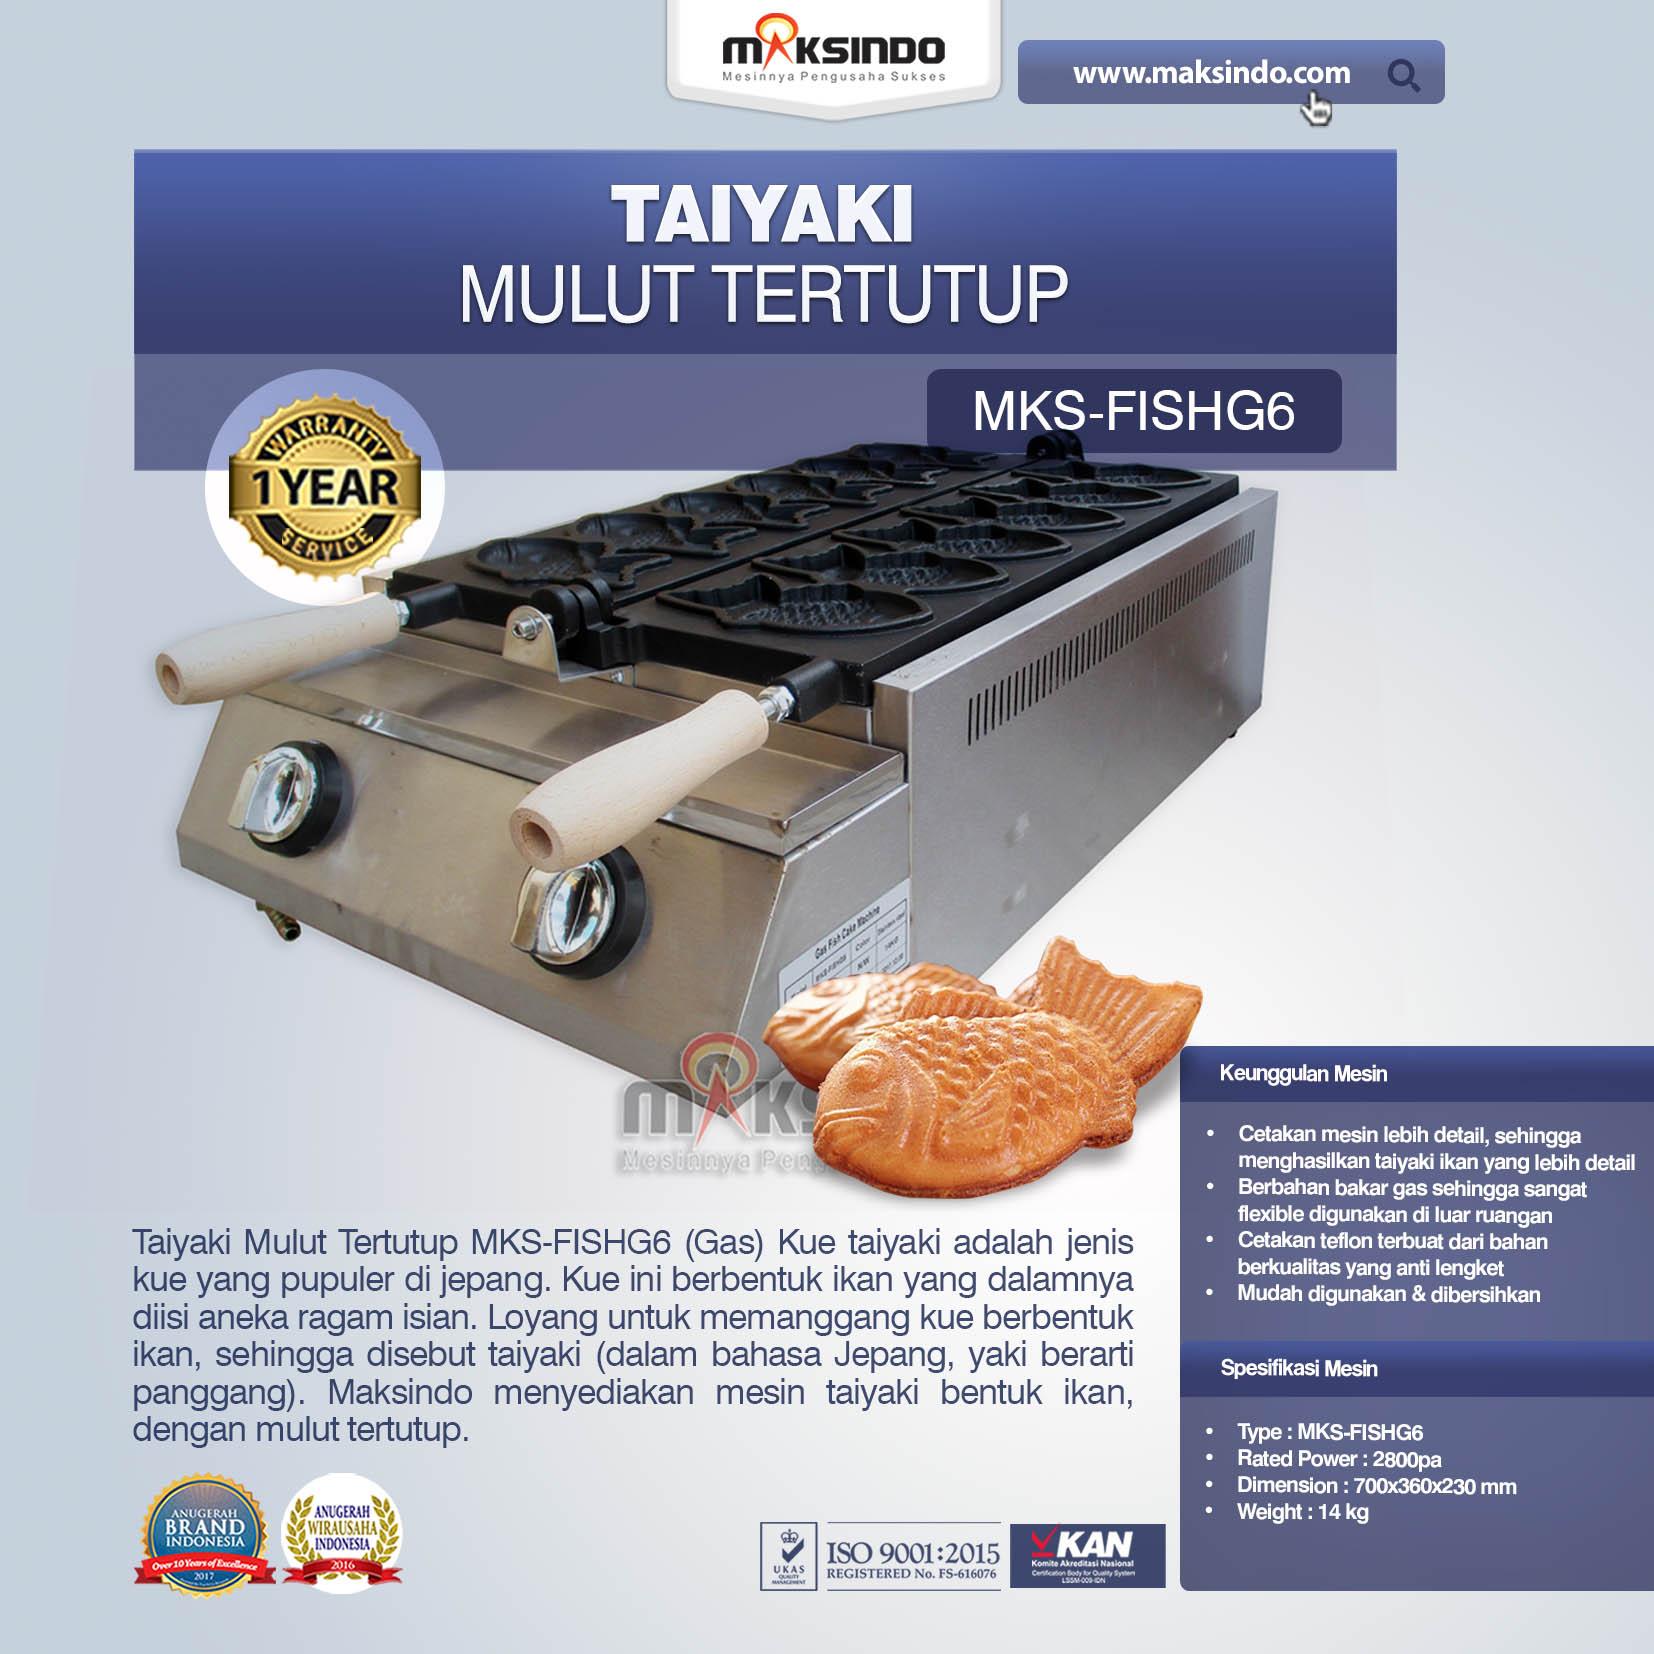 Taiyaki Mulut Tertutup (Gas) MKS-FISHG6